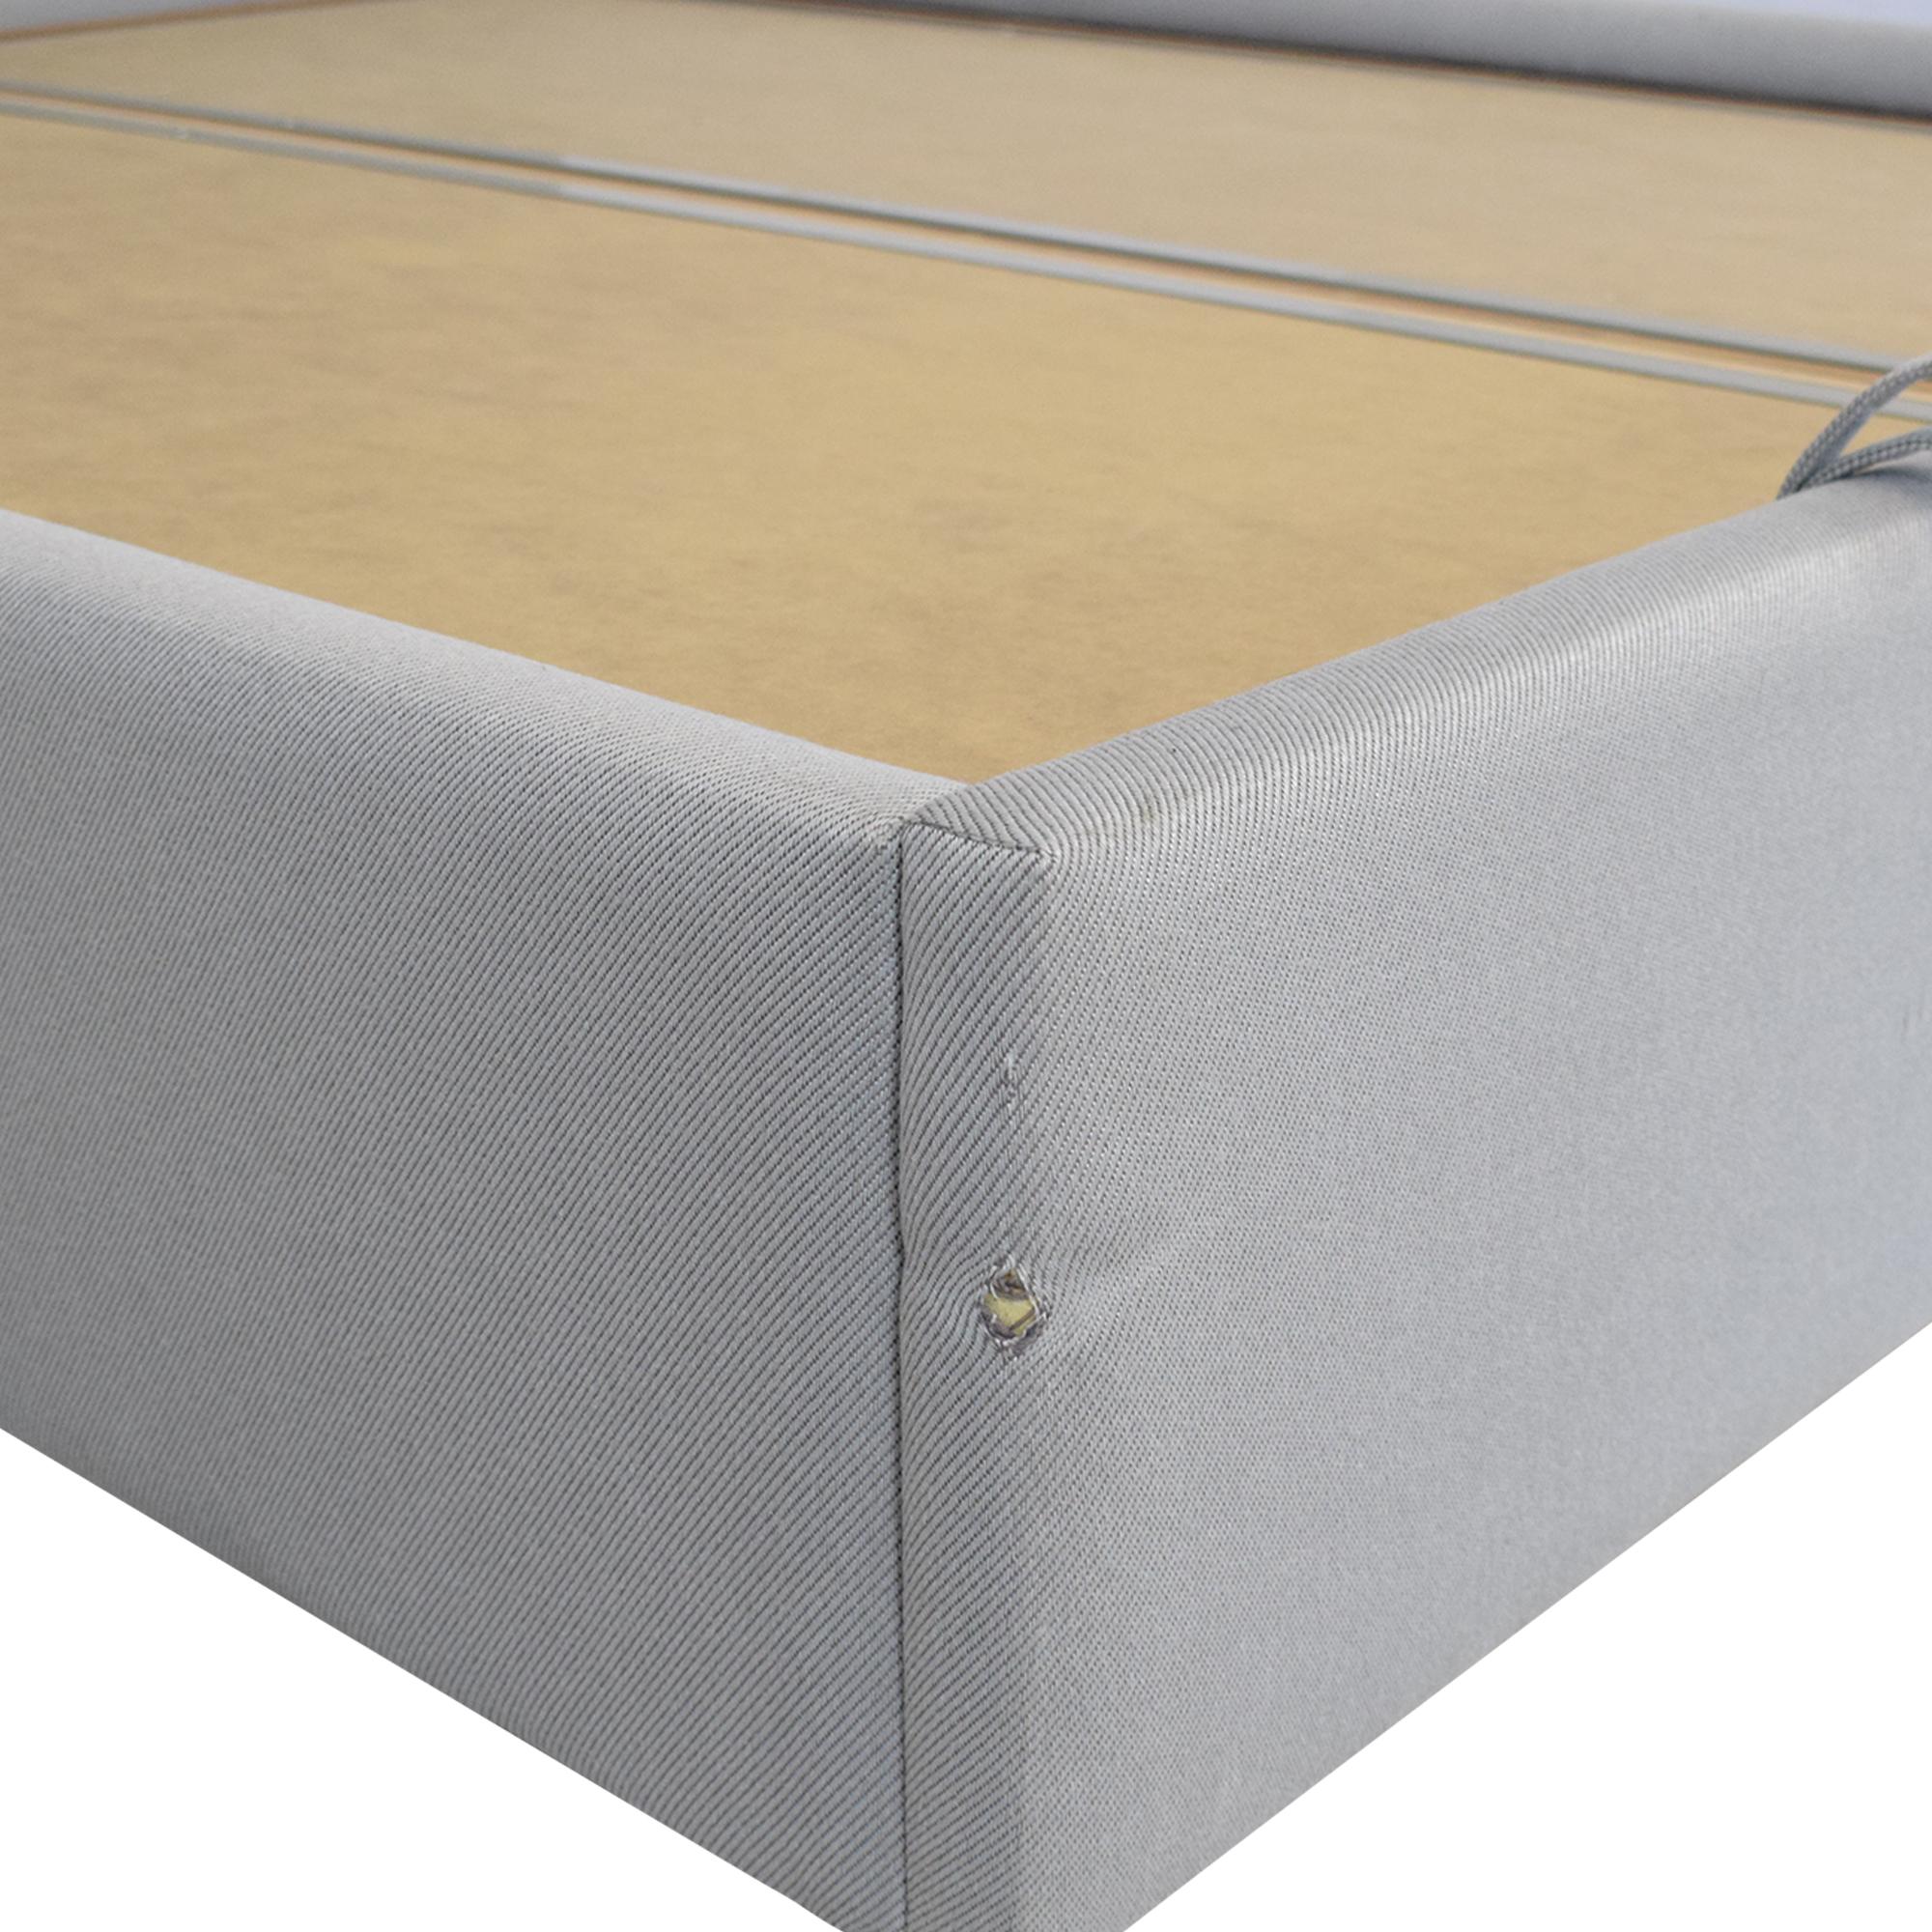 Upholstered Storage Queen Bed / Beds